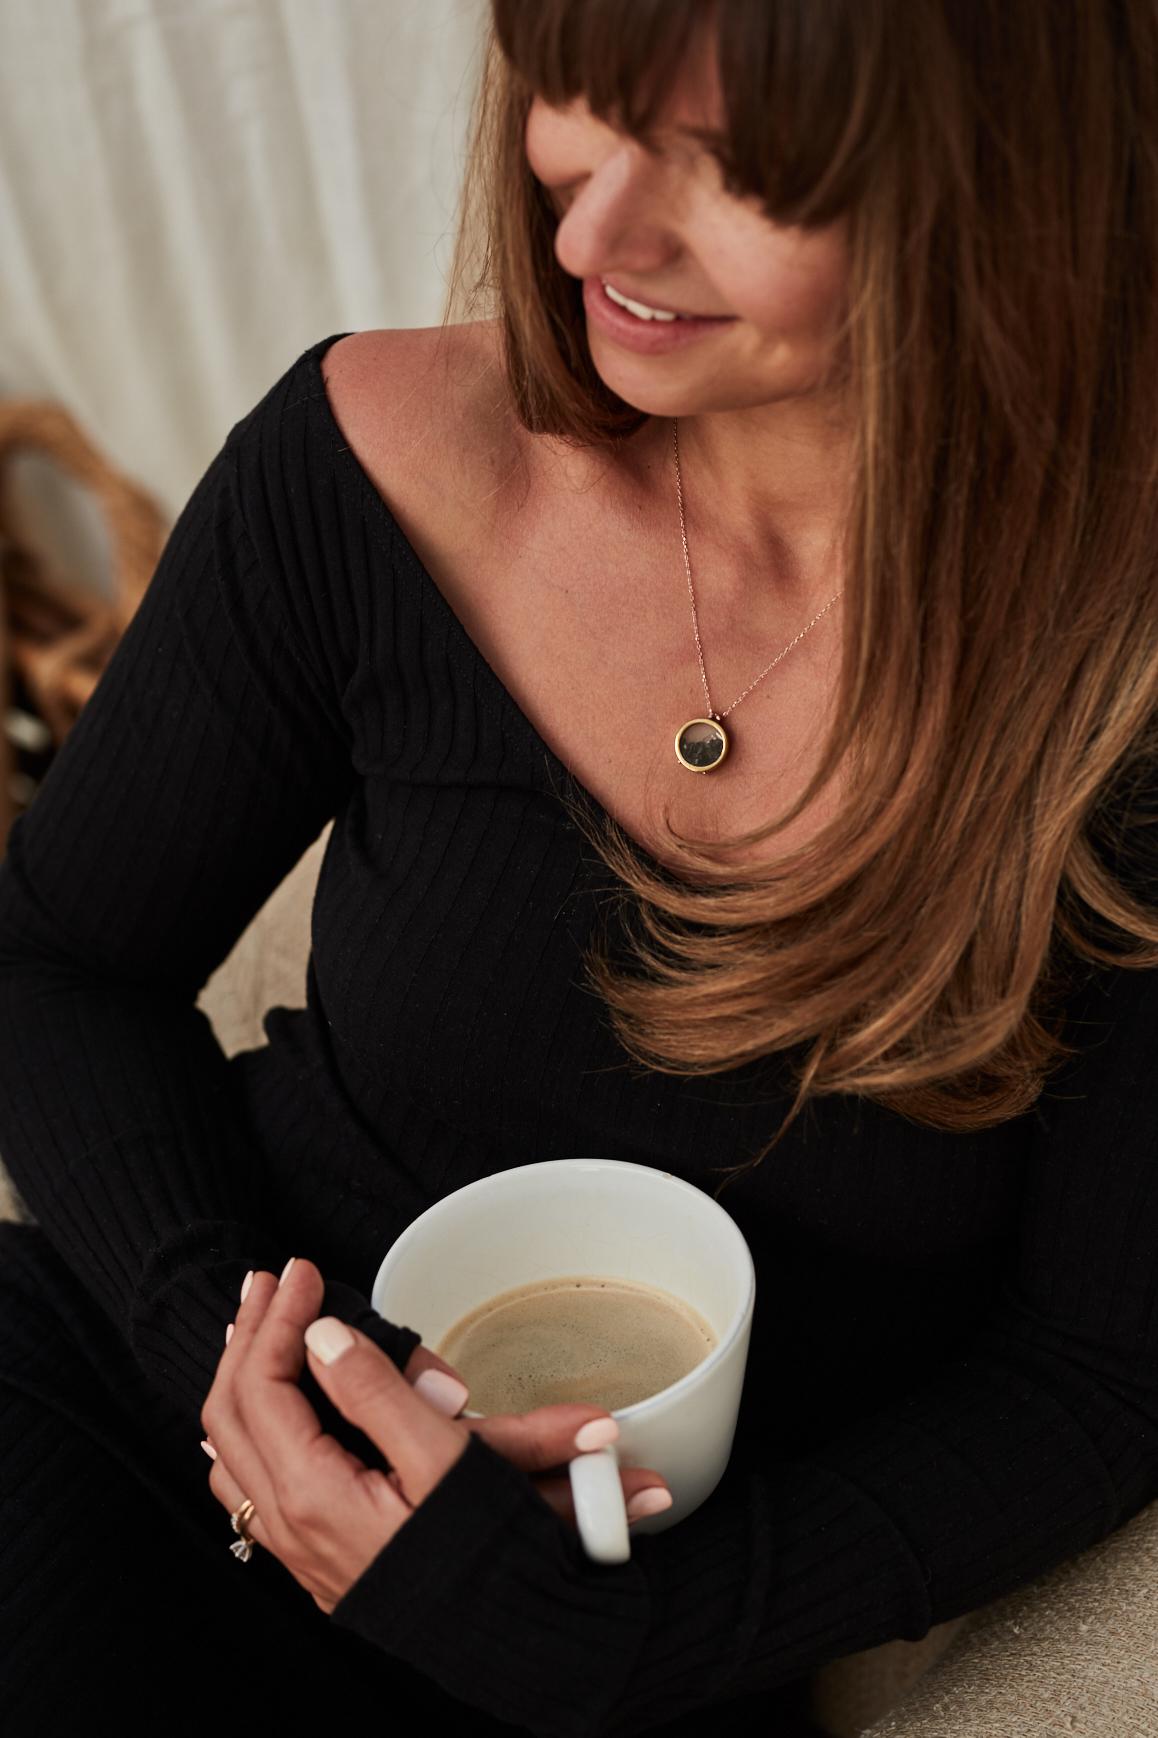 Is Coffee Worth Drinking? - Anna Lewandowska - healthy ...